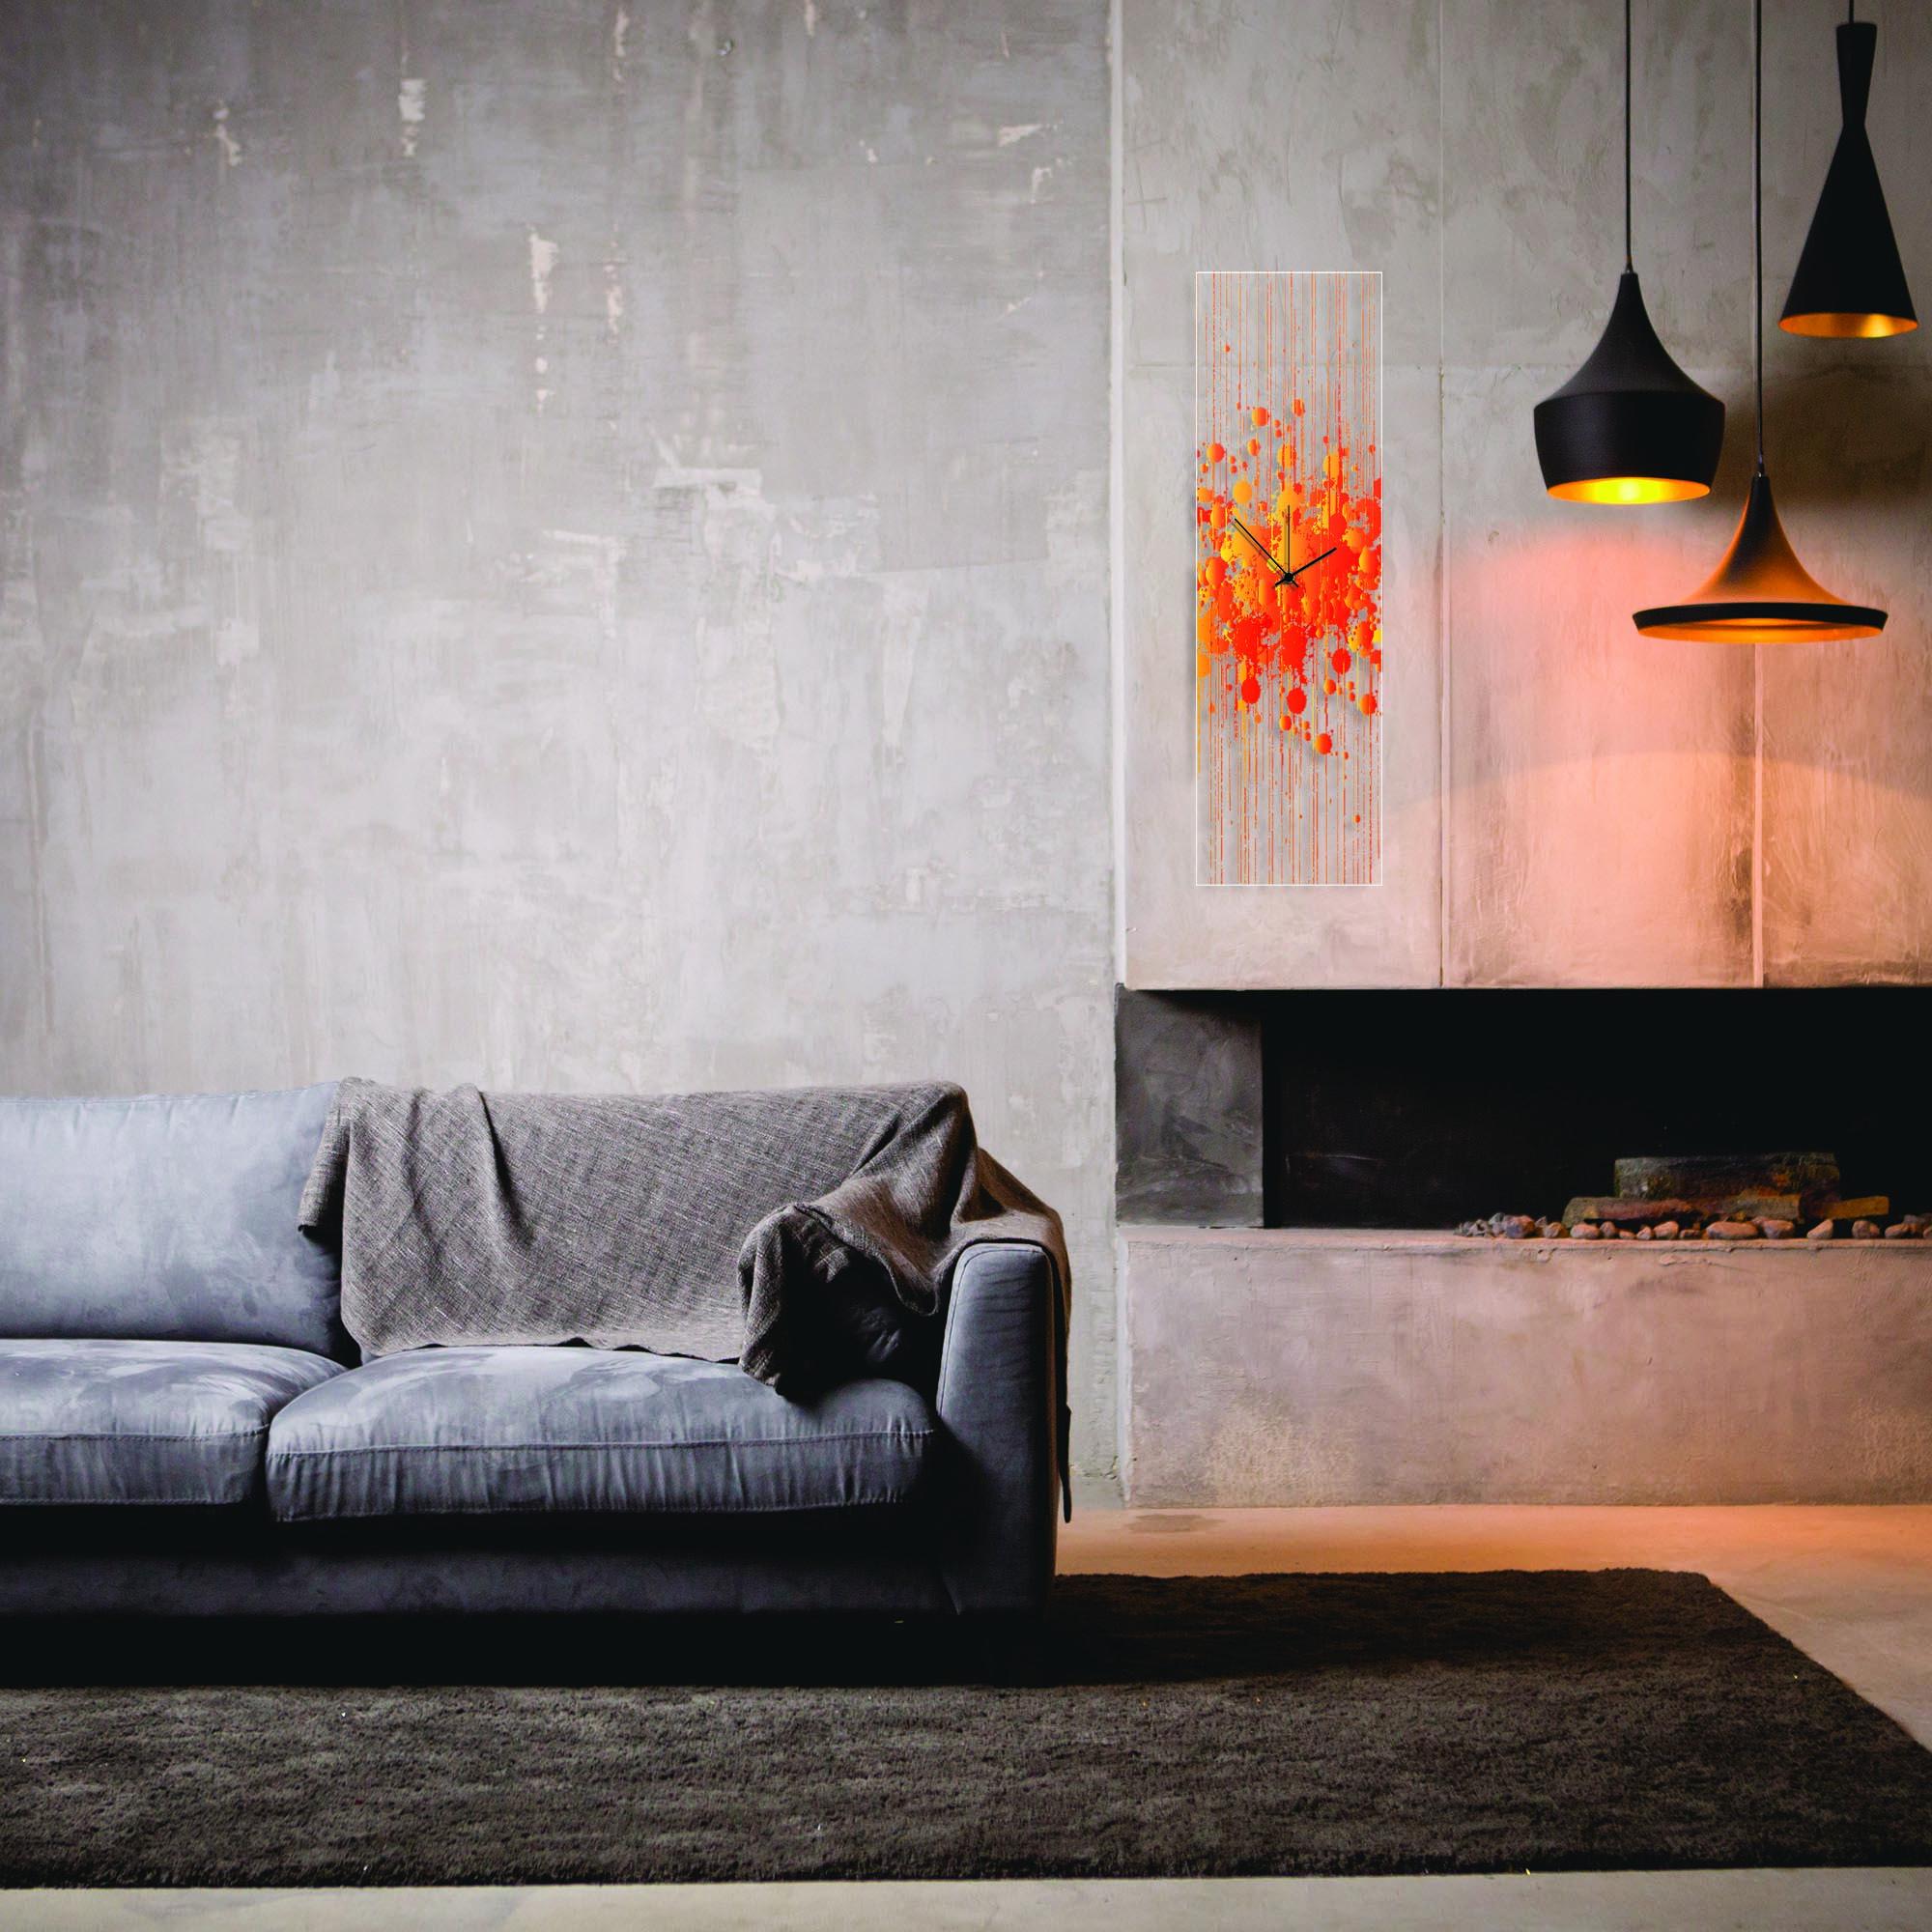 Warm Paint Splatter Clock by Adam Schwoeppe Contemporary Decor on Plexiglass - Lifestyle View